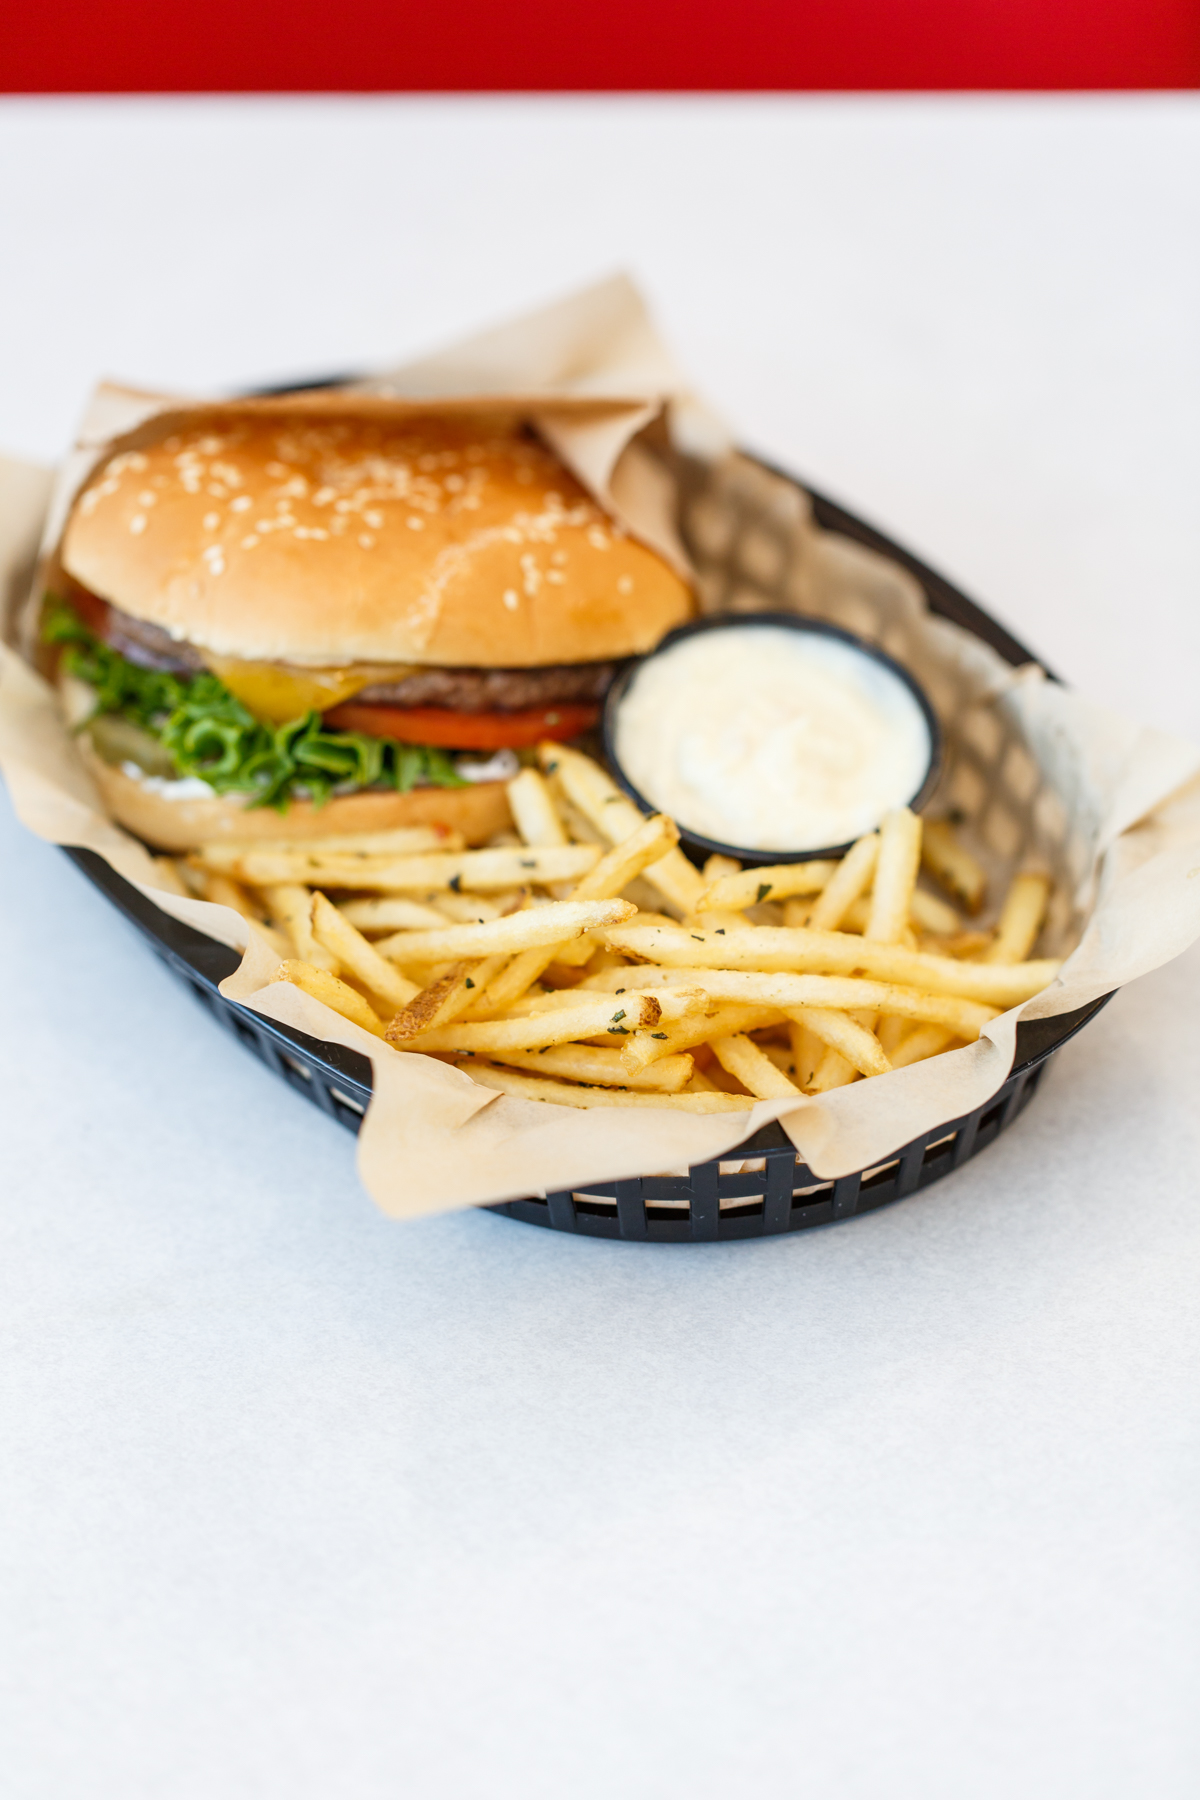 Burgerville_Spring 2018_Fries + Shake_Andrea Lonas Photography_prelim-008.jpg